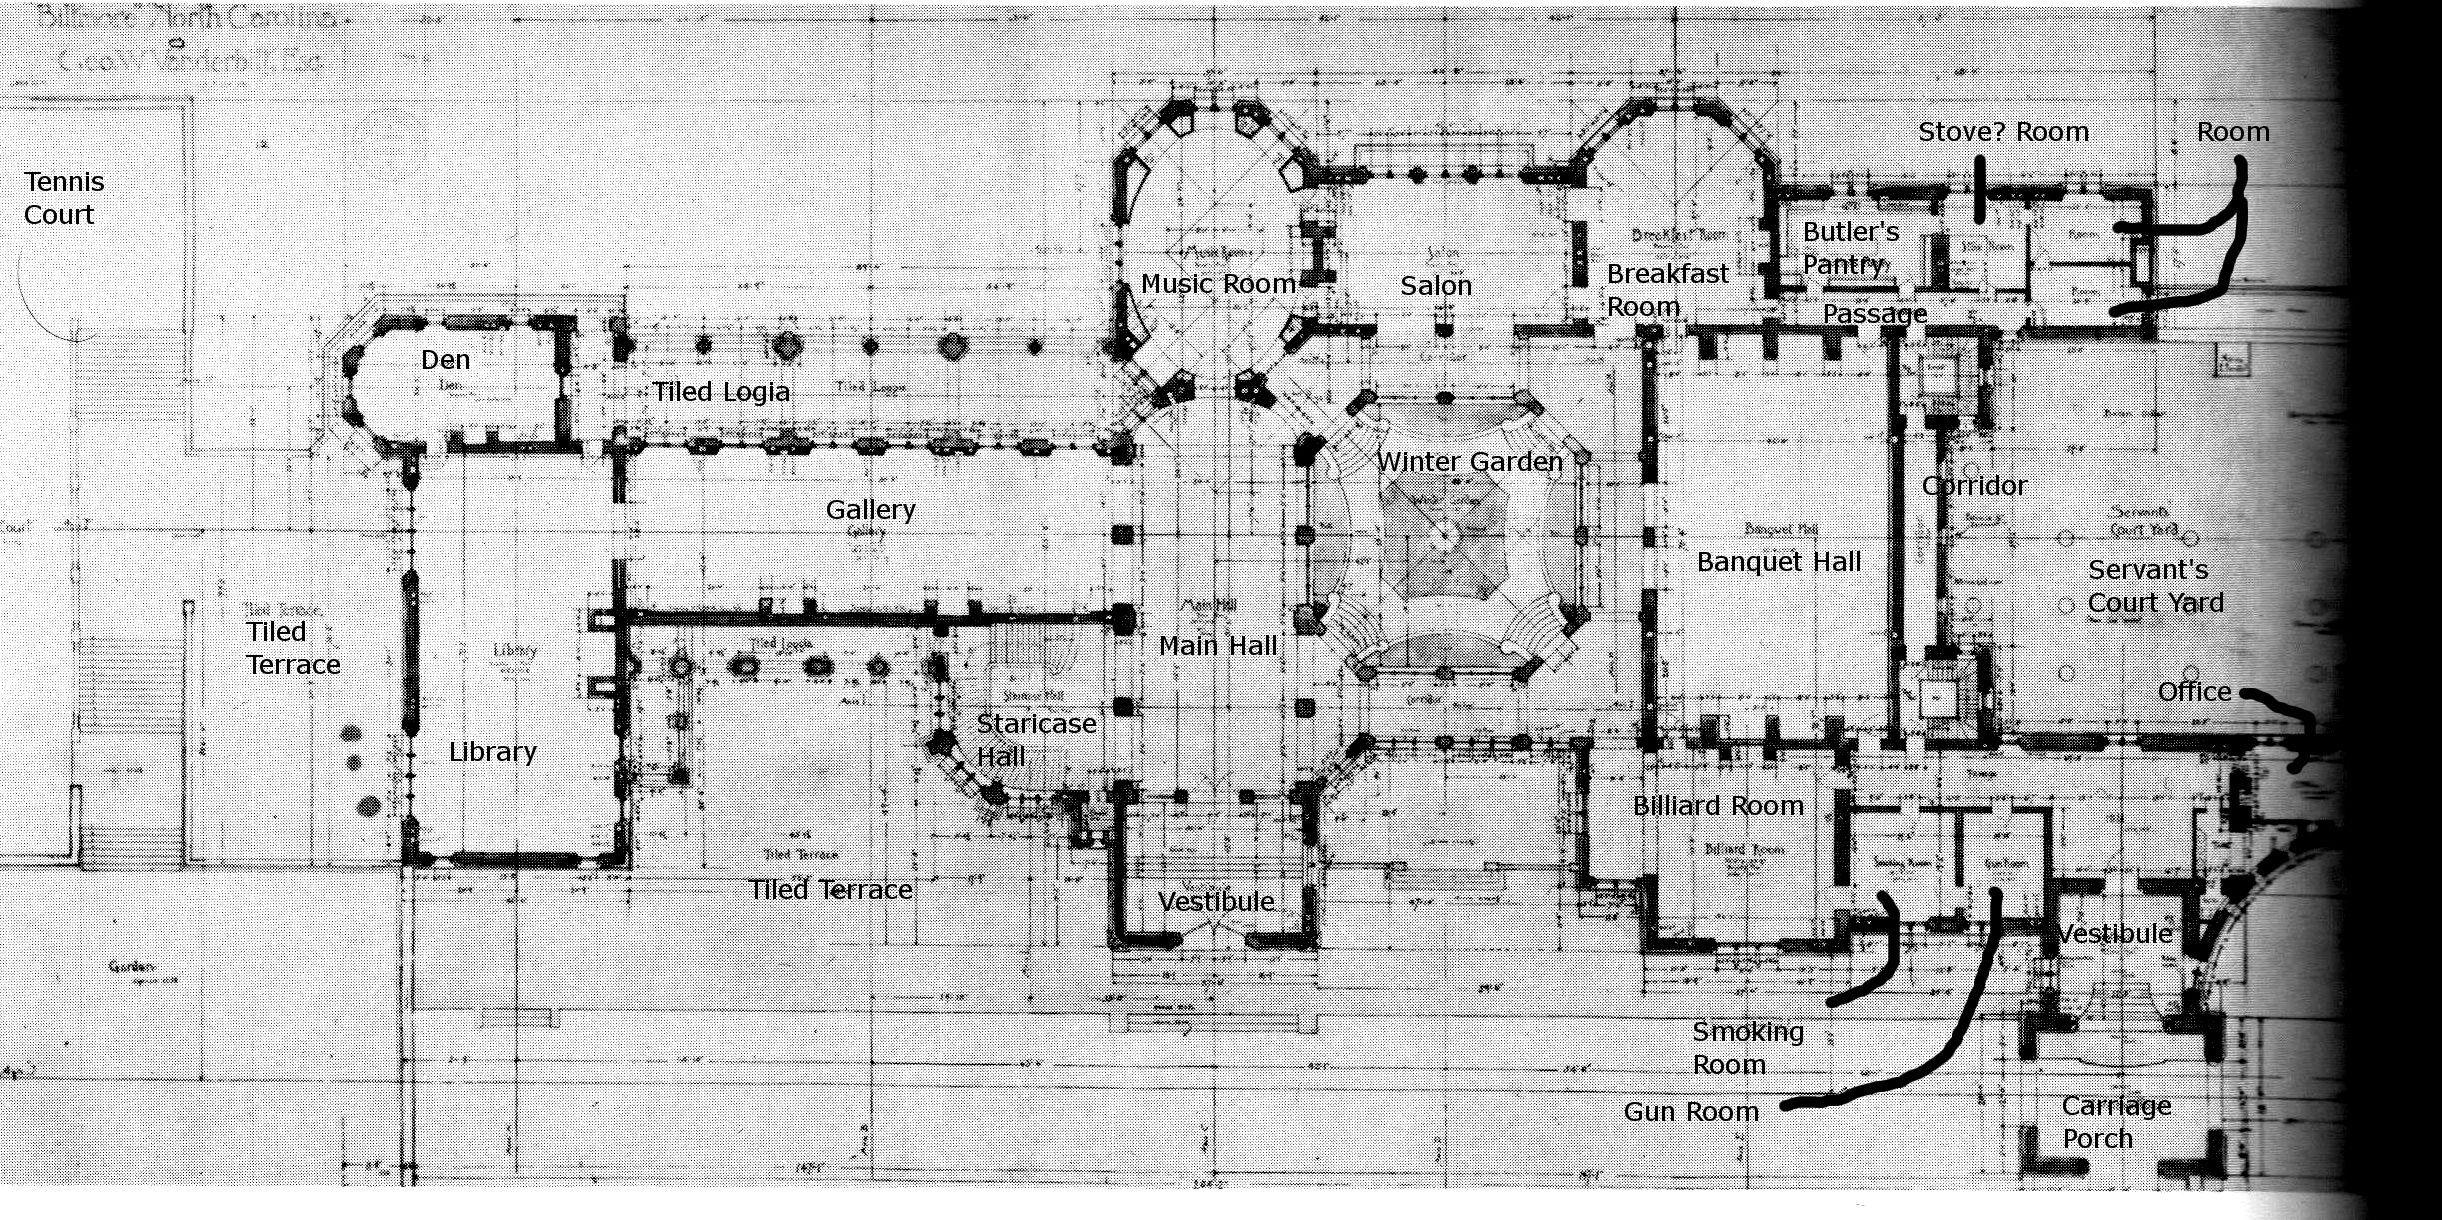 Pin By Shorna Richards On Biltmore Biltmore Estate Interior Estate Interior Mansion Floor Plan